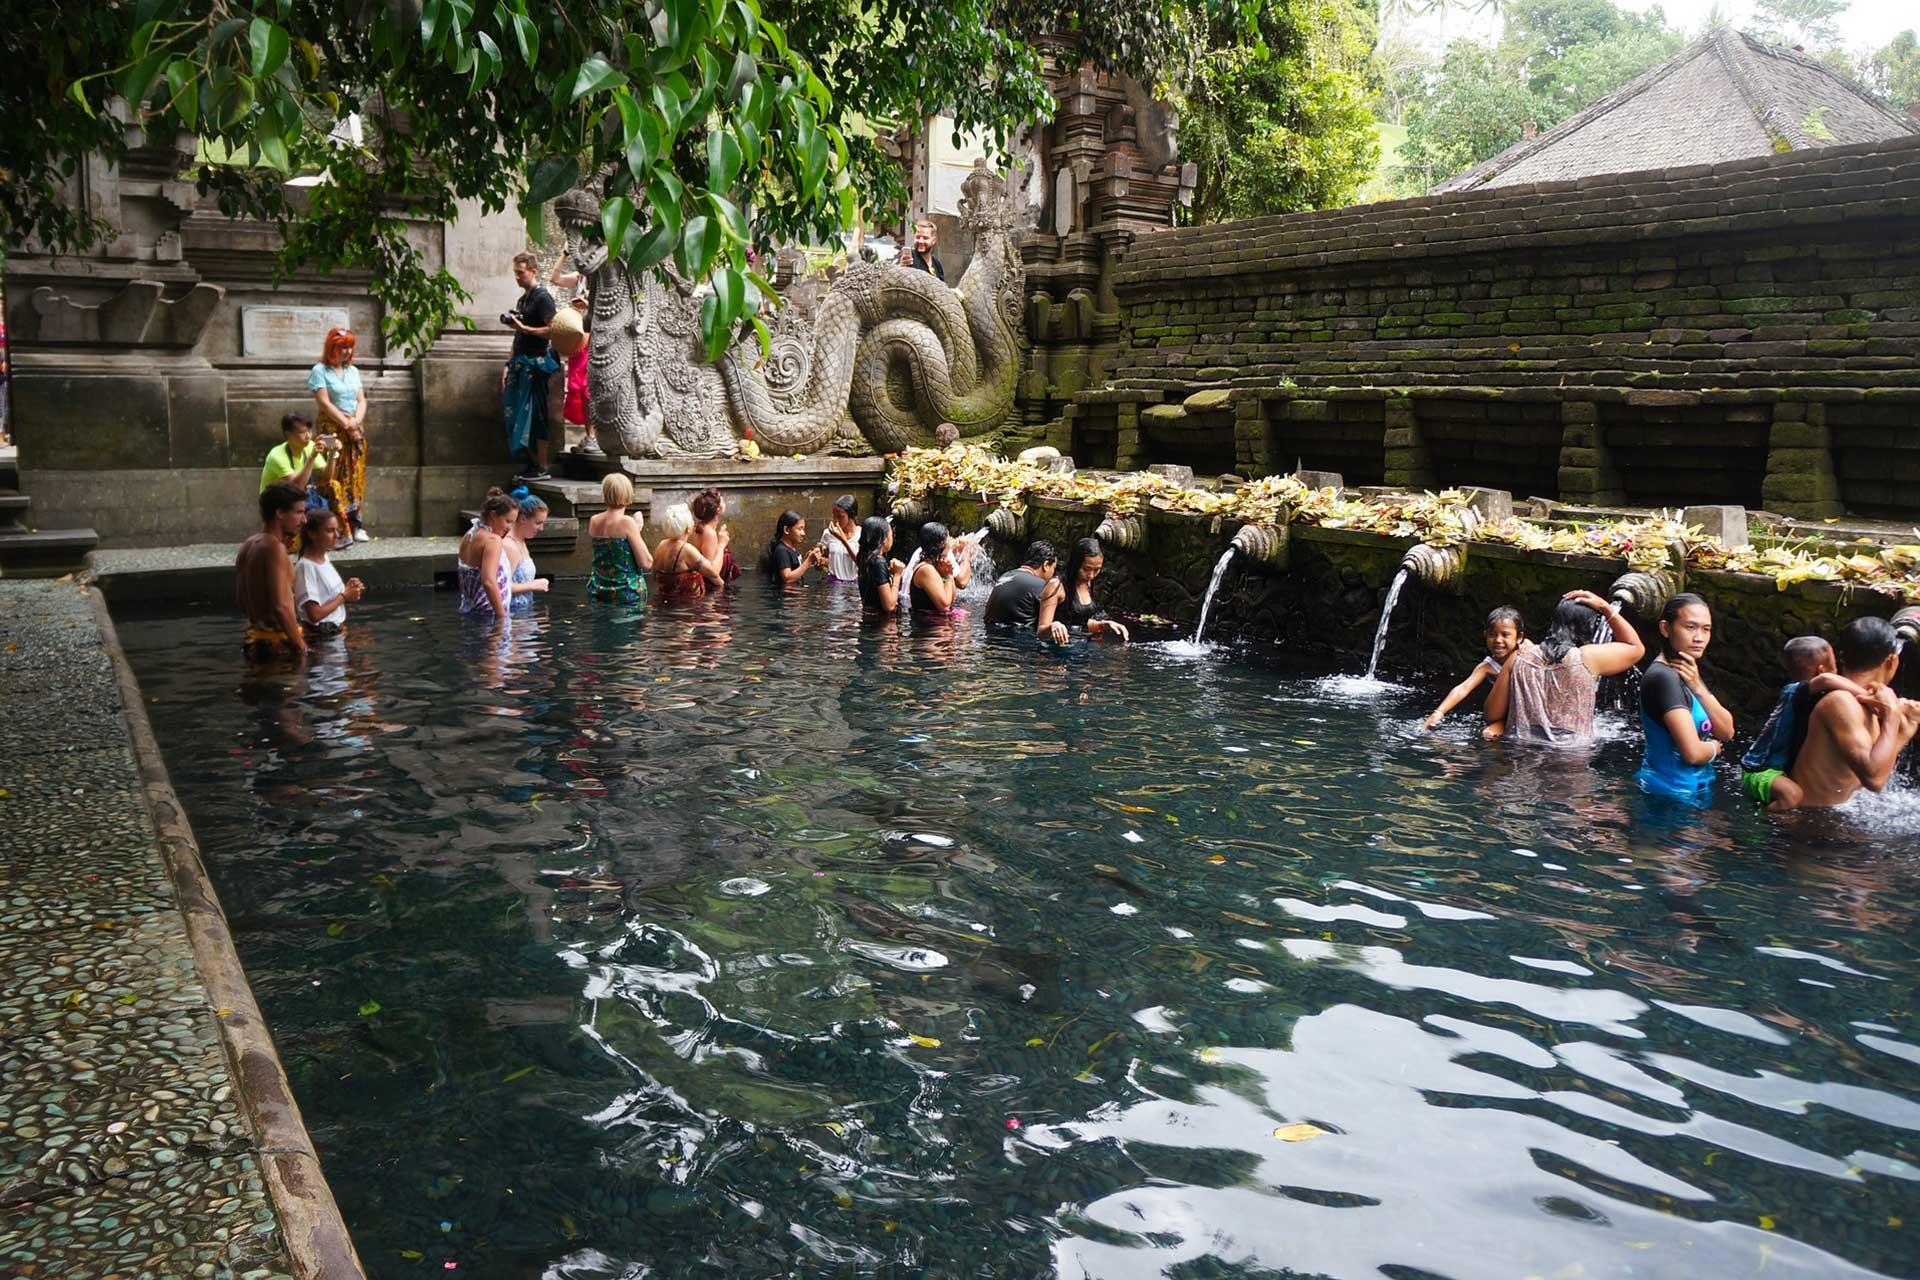 tempio acqua sacra, bali, indonesia